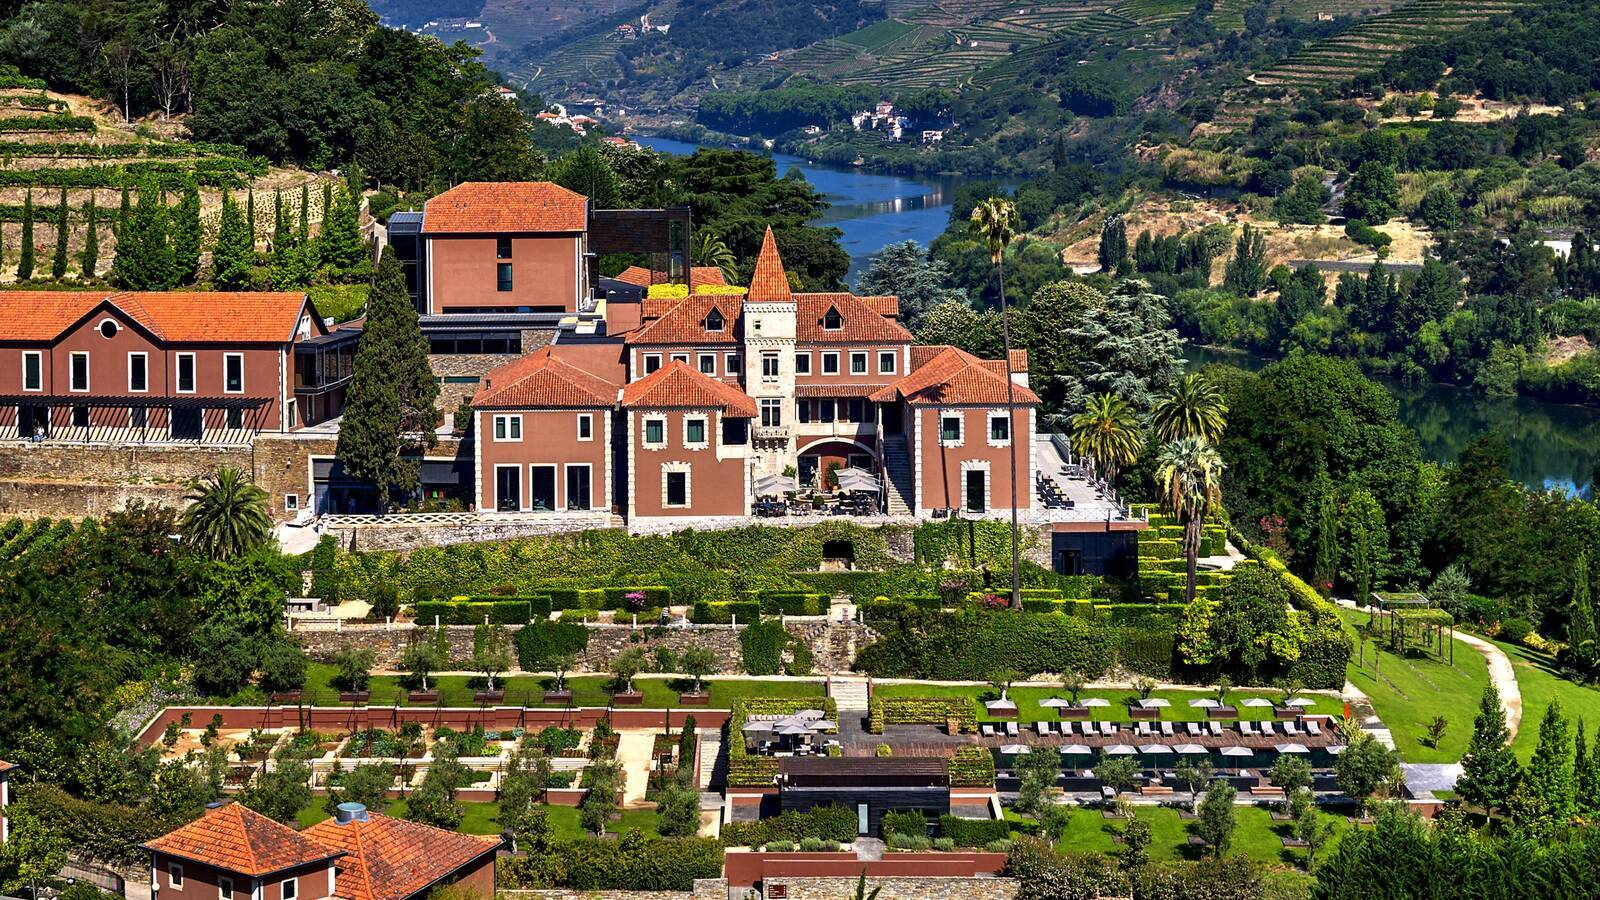 Six Senses Douro Valley Vue Aerienne